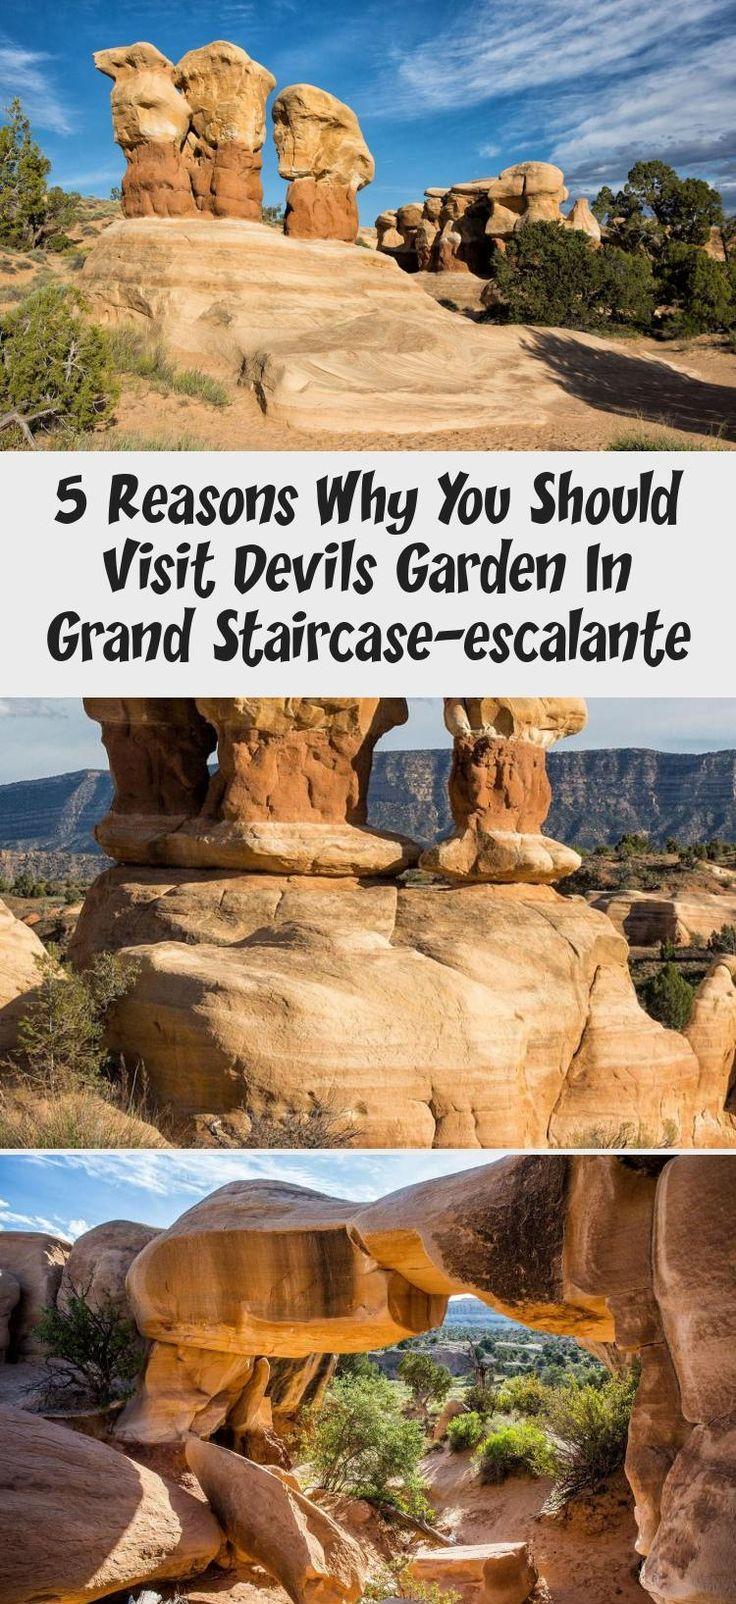 Devils Garden, Grand StaircaseEscalante National Monument